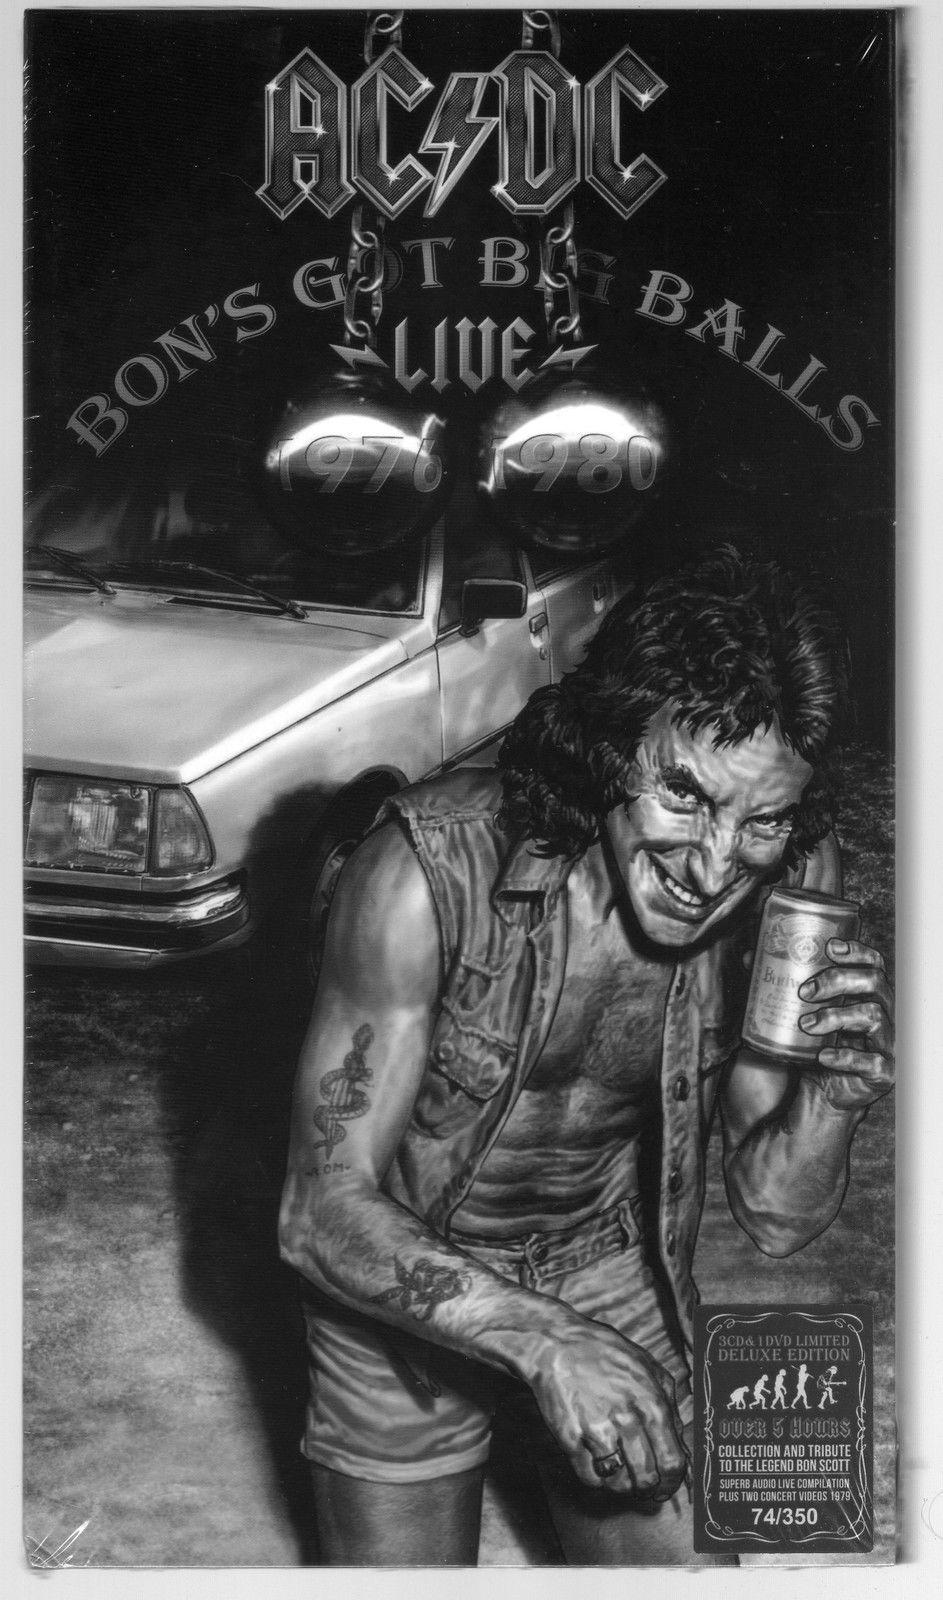 AC / DC Bon's Got Big Balls Live -- 3 CD & DVD Box Set